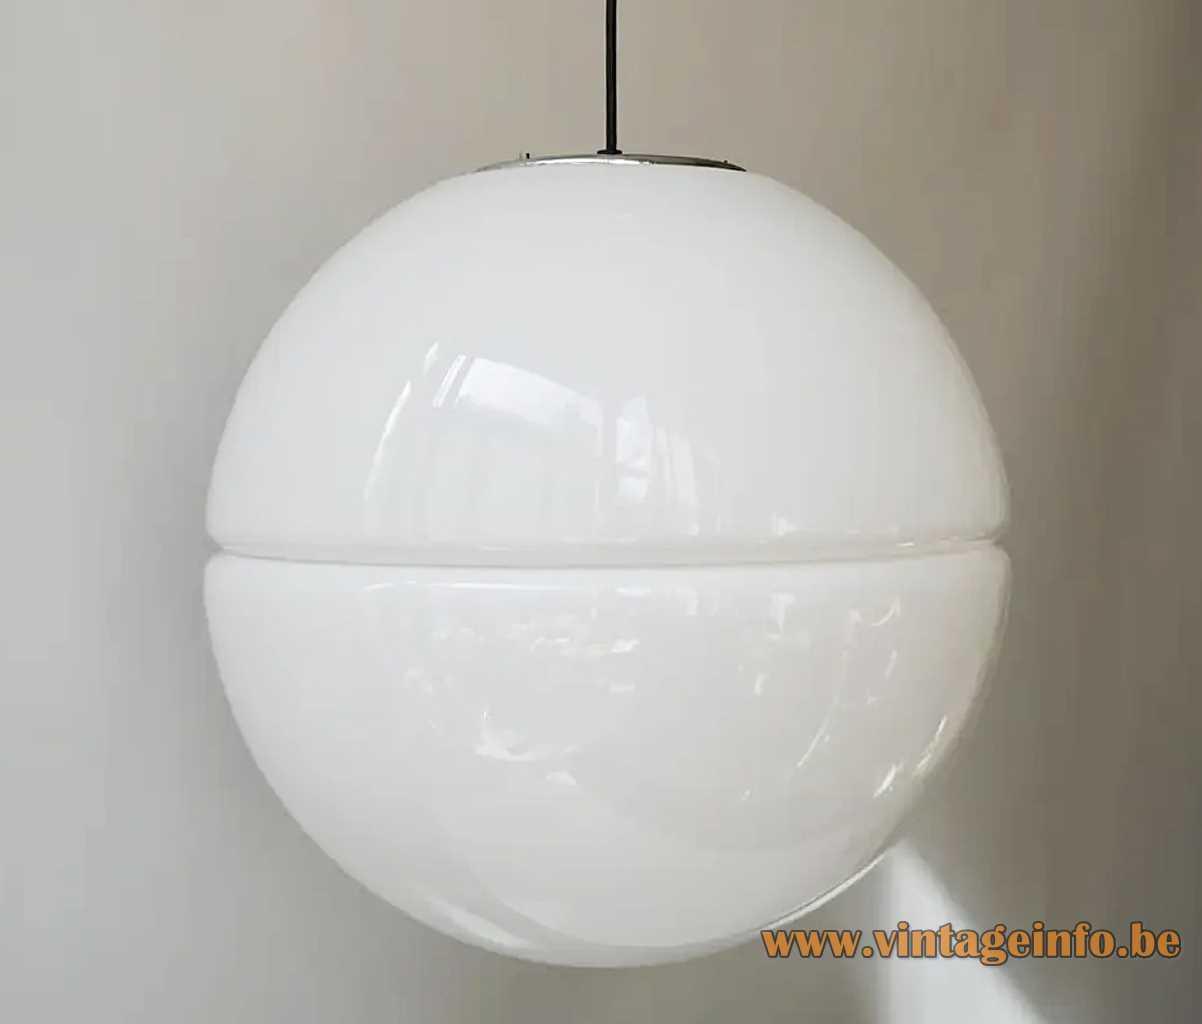 iGuzzini Sfera pendant lamp big white plastic globe lampshade 2 shells 1970s Harvey Guzzini Italy